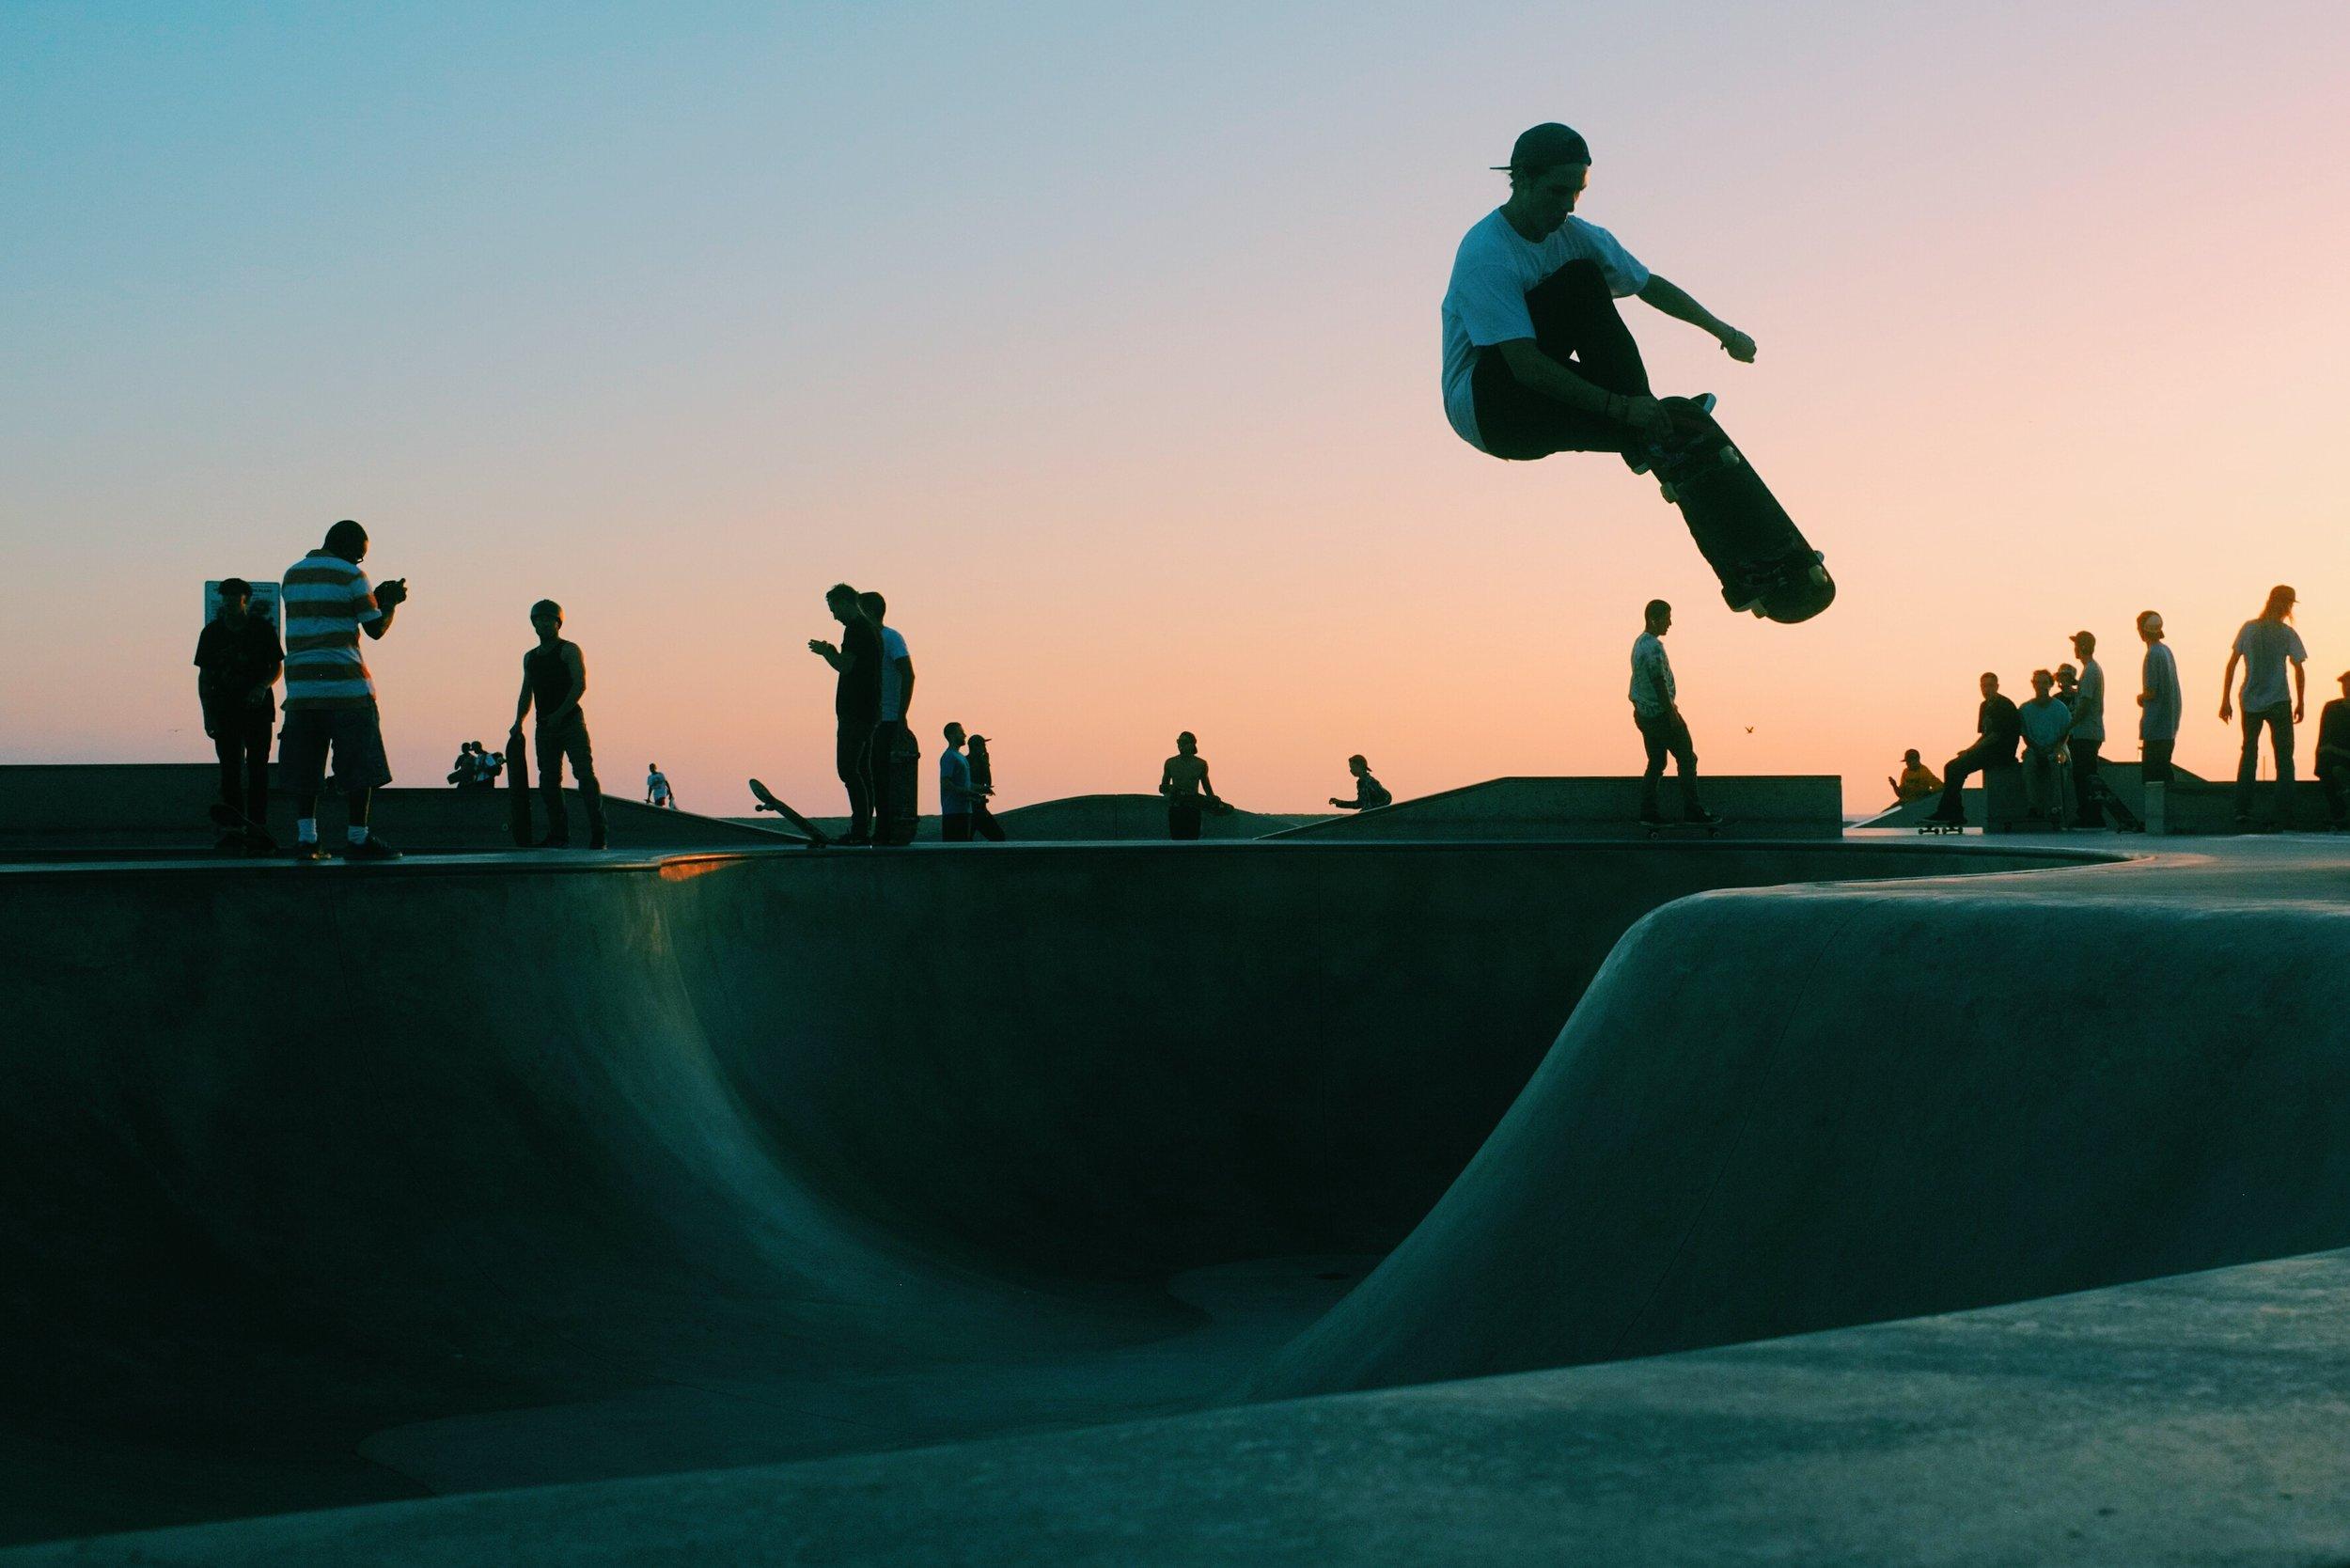 Photo by  Robson Hatsukami Morgan on  Unsplash